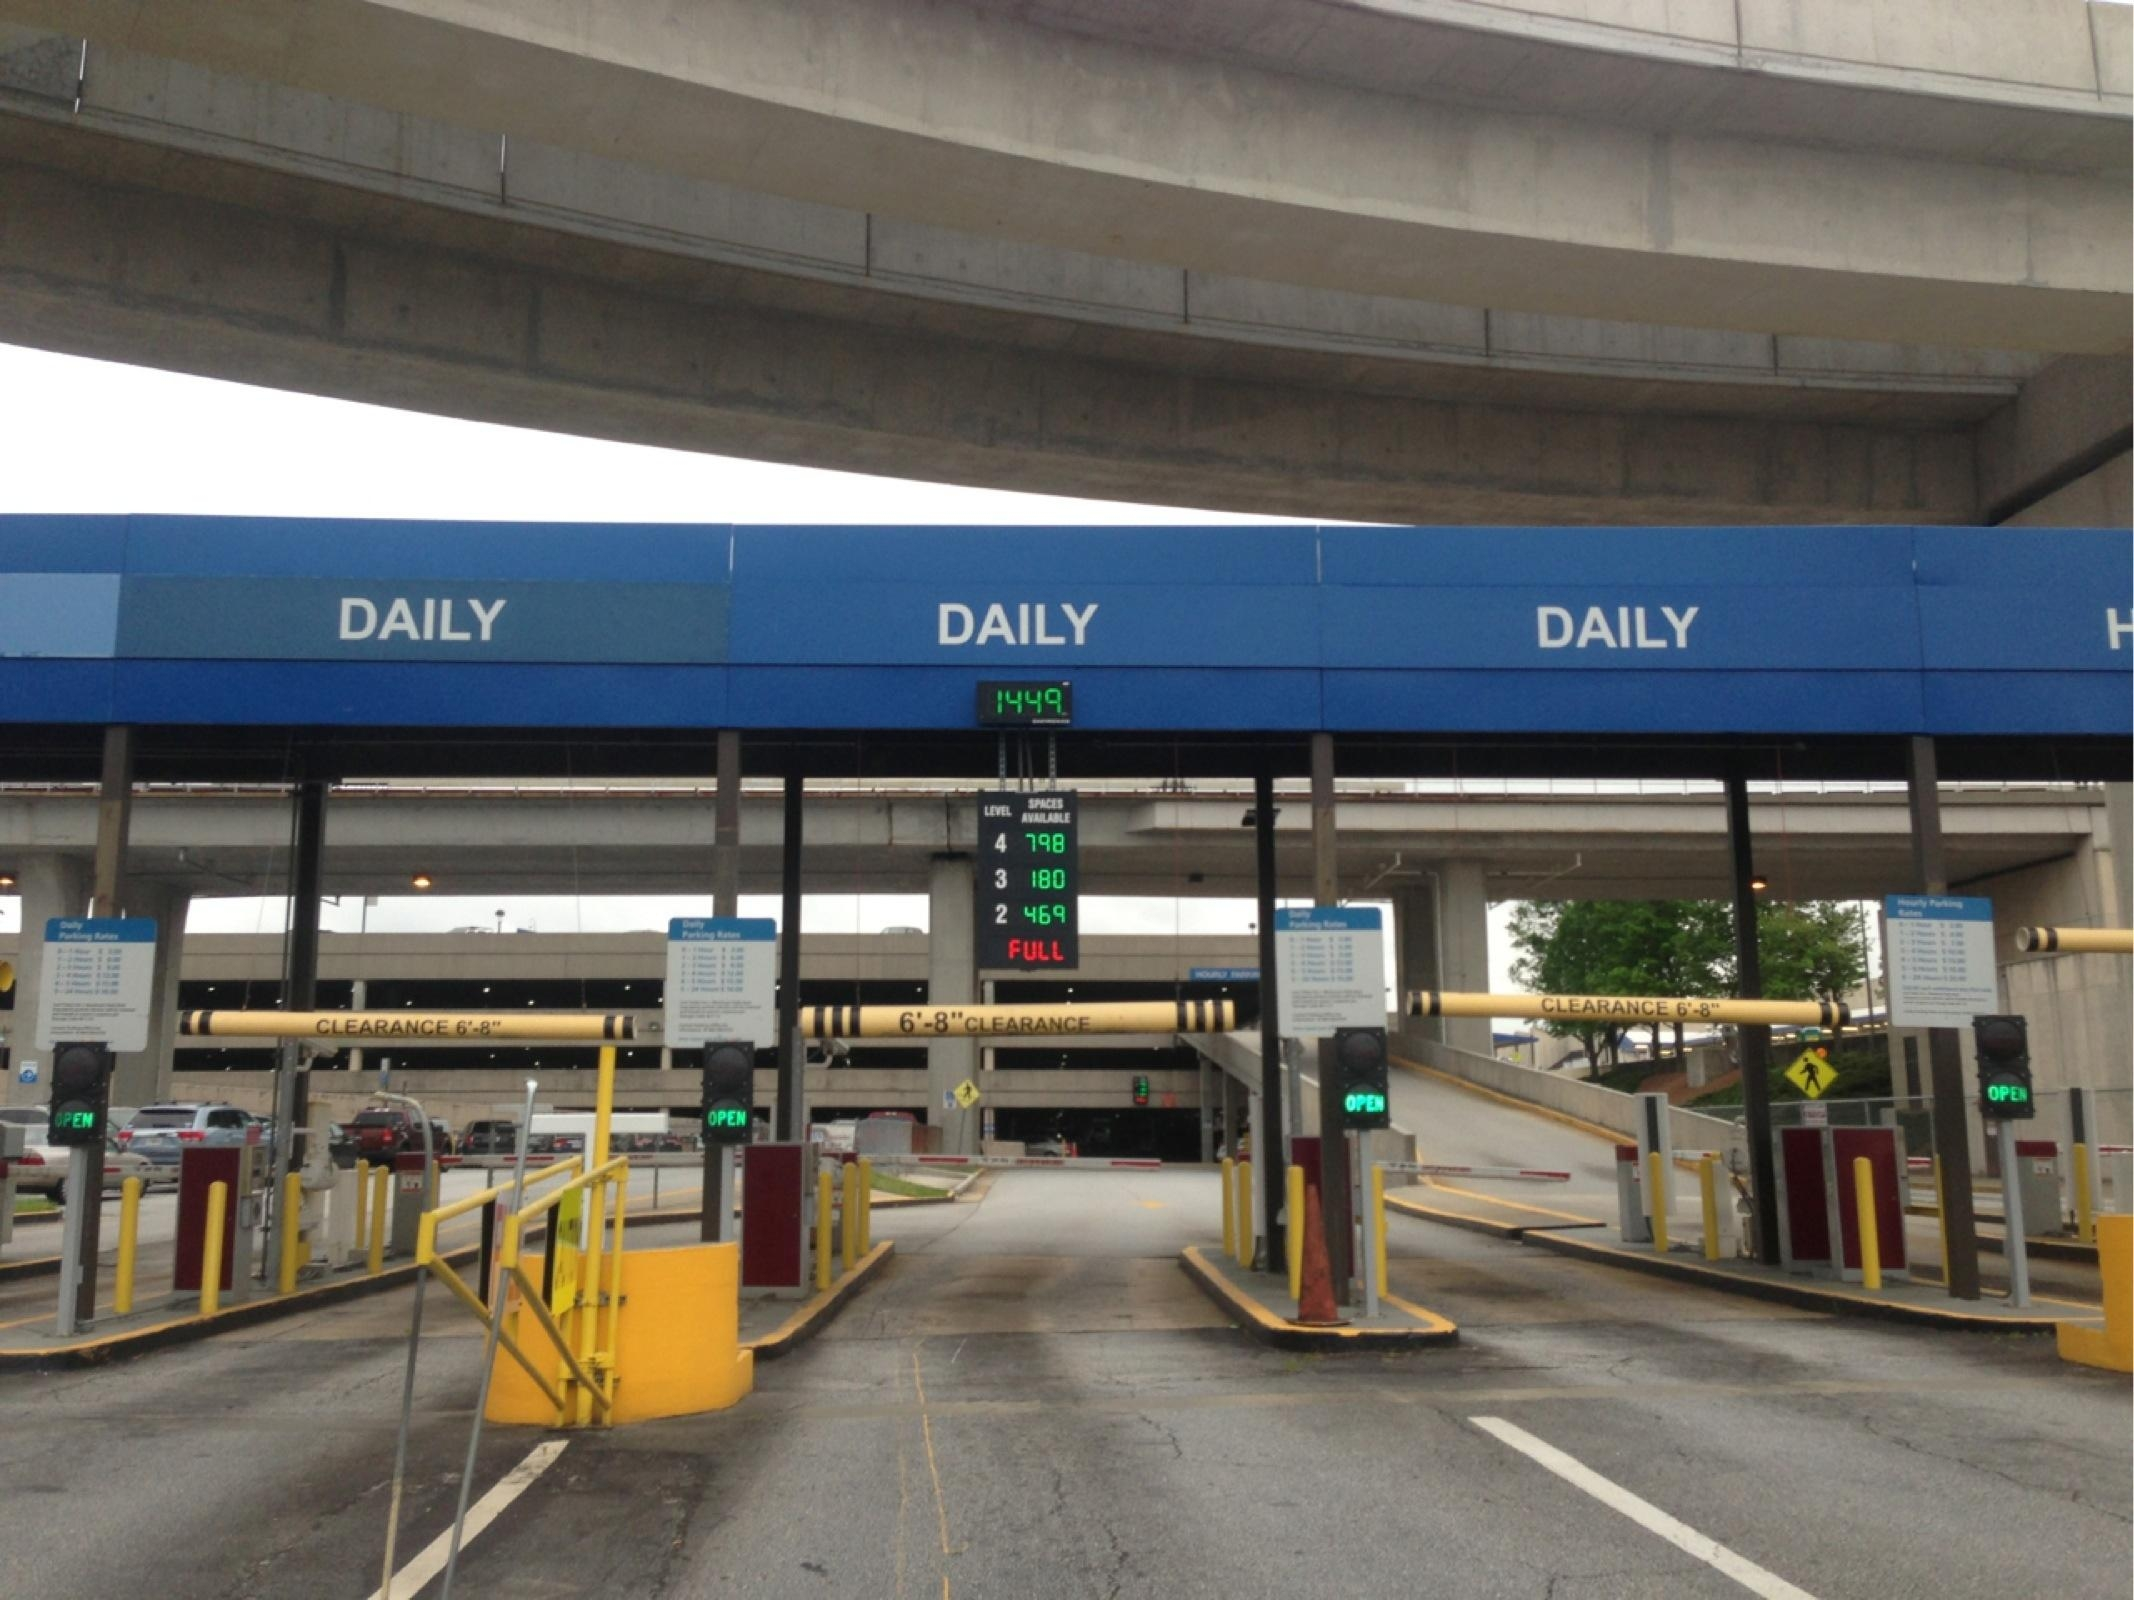 Atl Daily North Parking In Atlanta Parkme